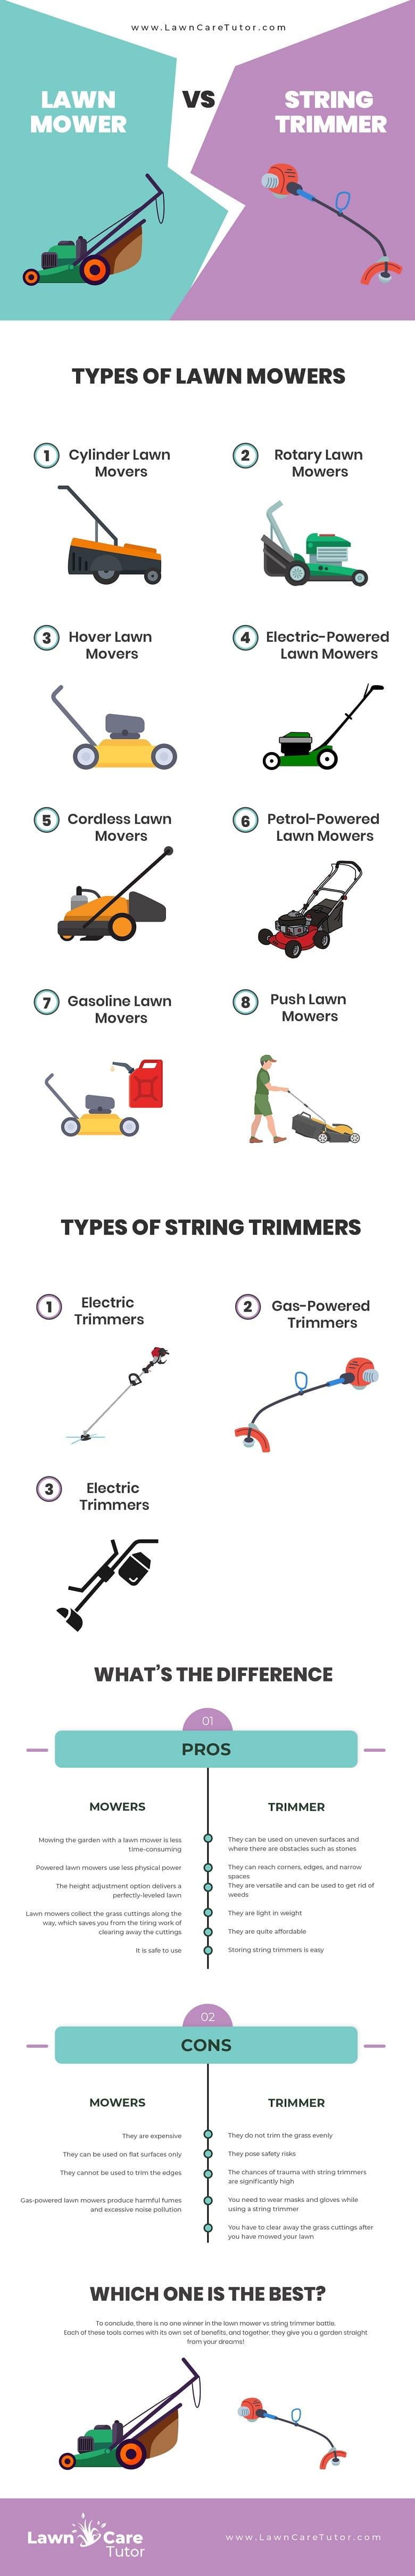 Lawn Mower vs. String Trimmer